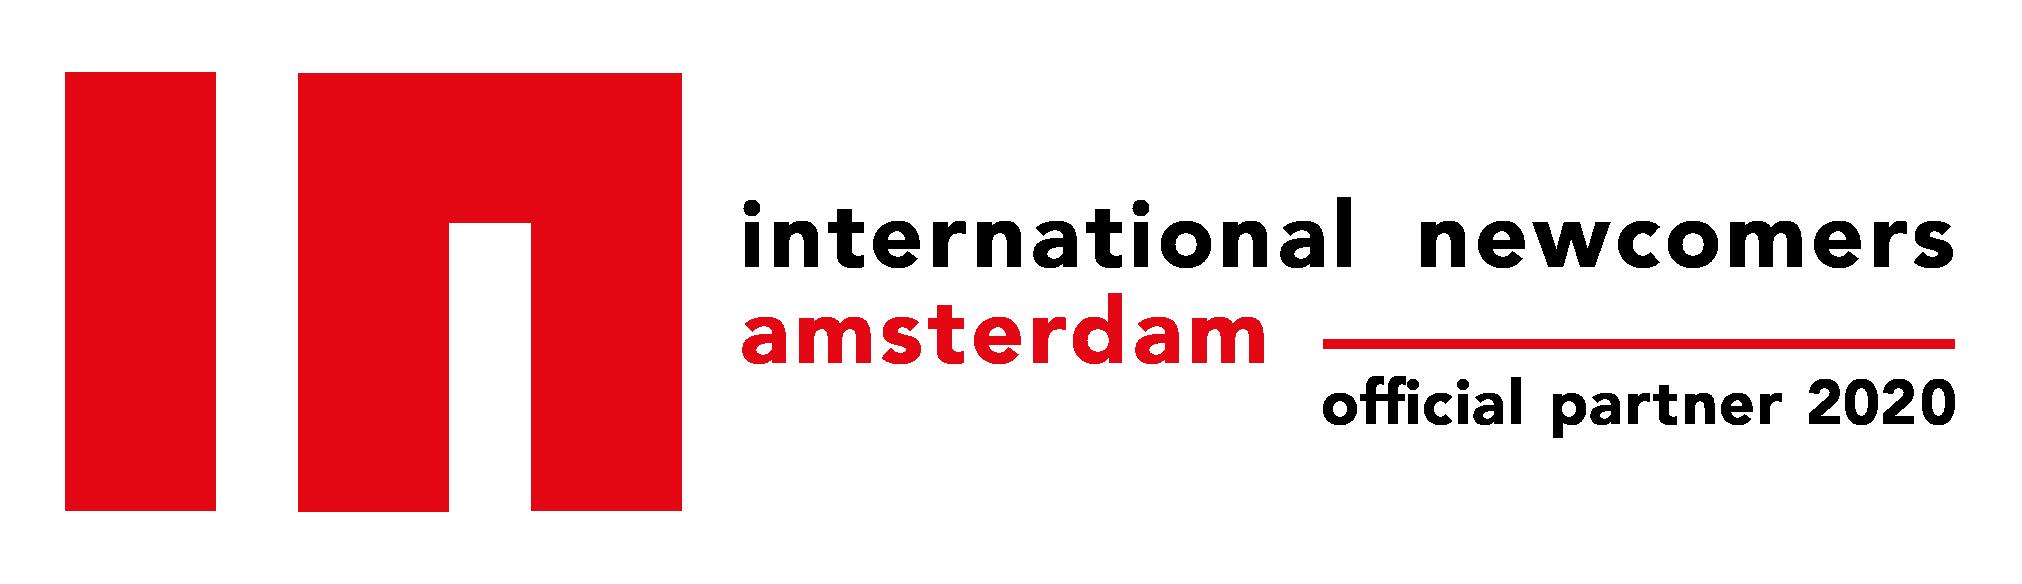 iamsterdam partner logo